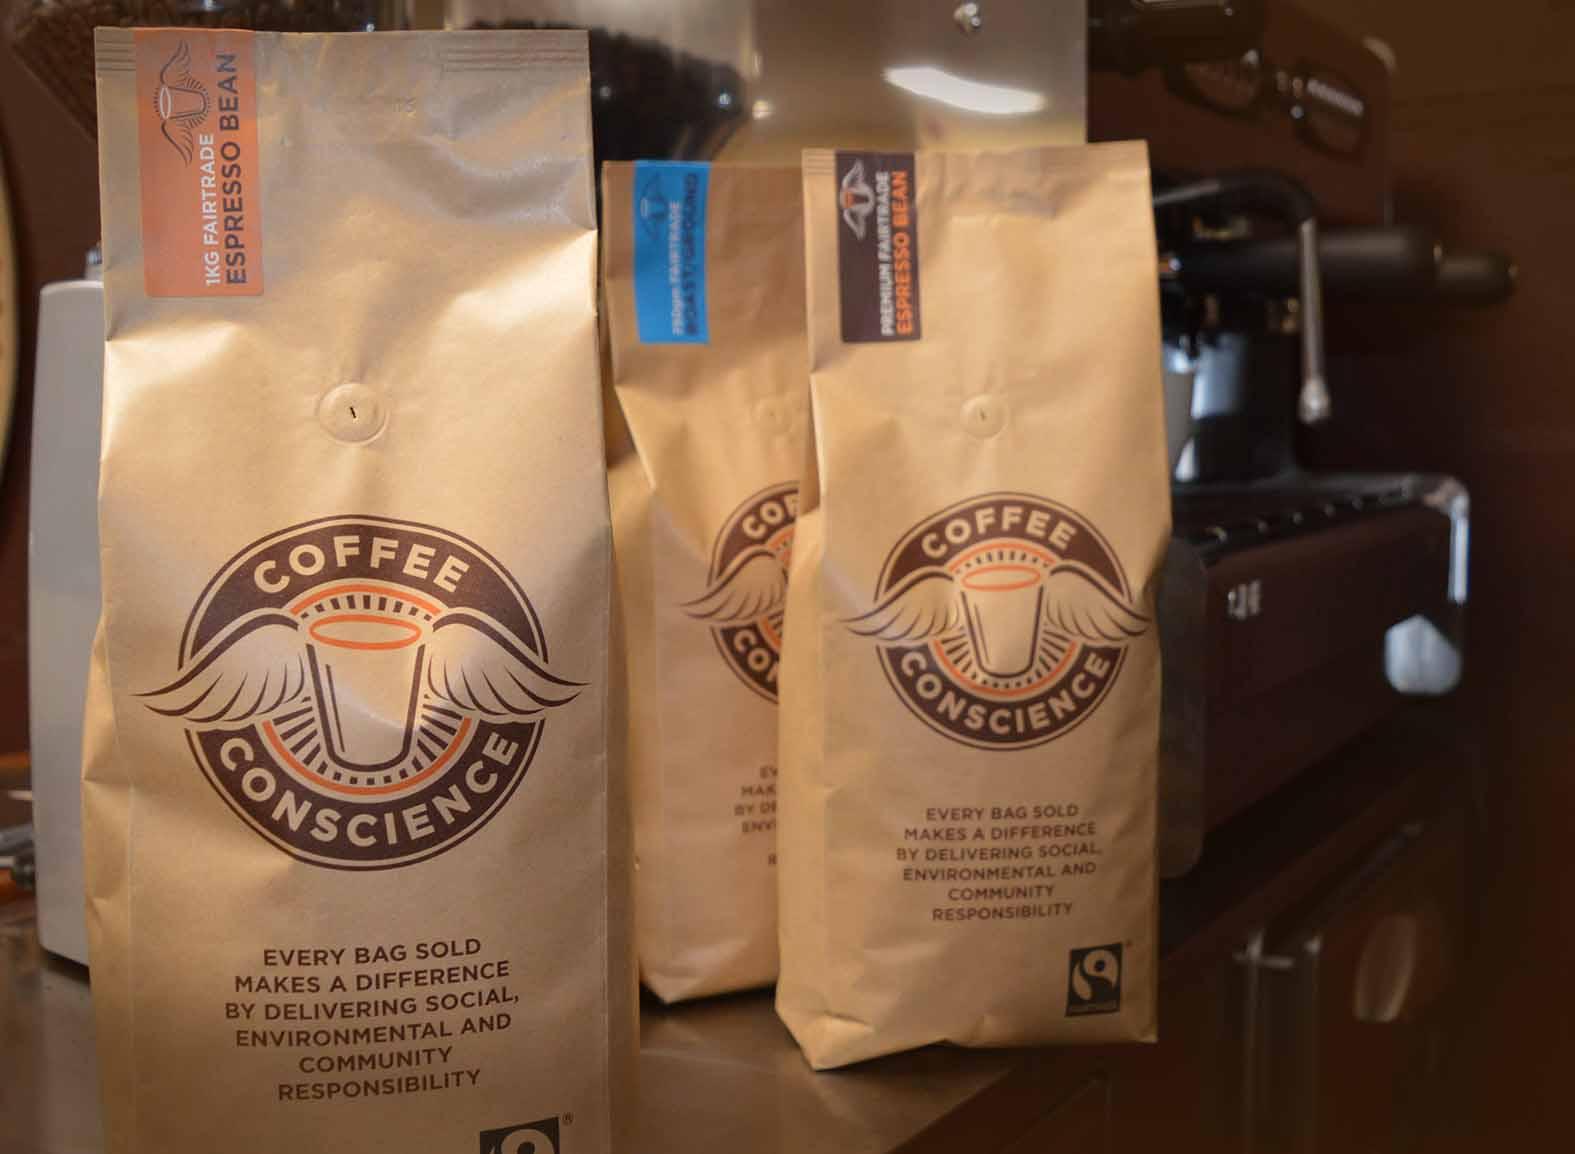 Starbucks Coffee Bag Design